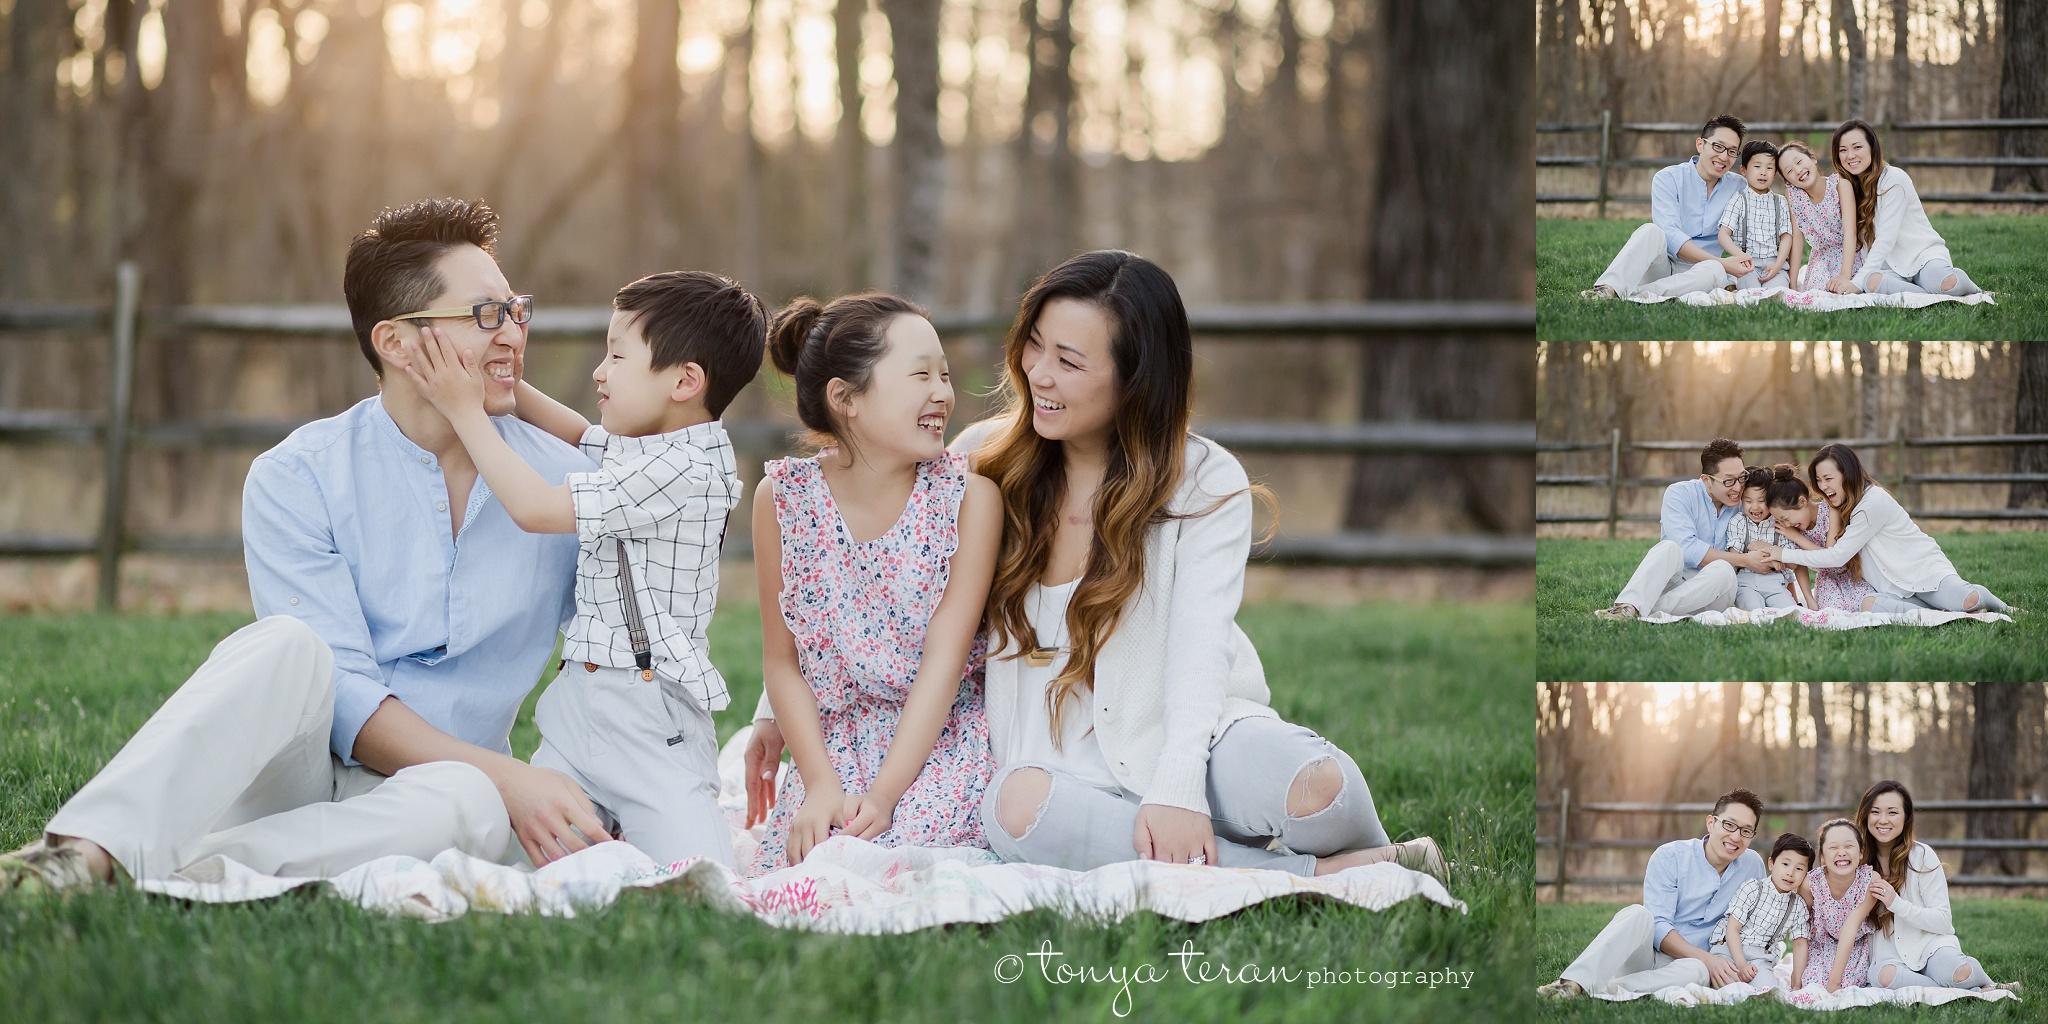 Cherry Blossom Tree Session   Tonya Teran Photography, Potomac, MD Newborn, Baby and Family Photographer